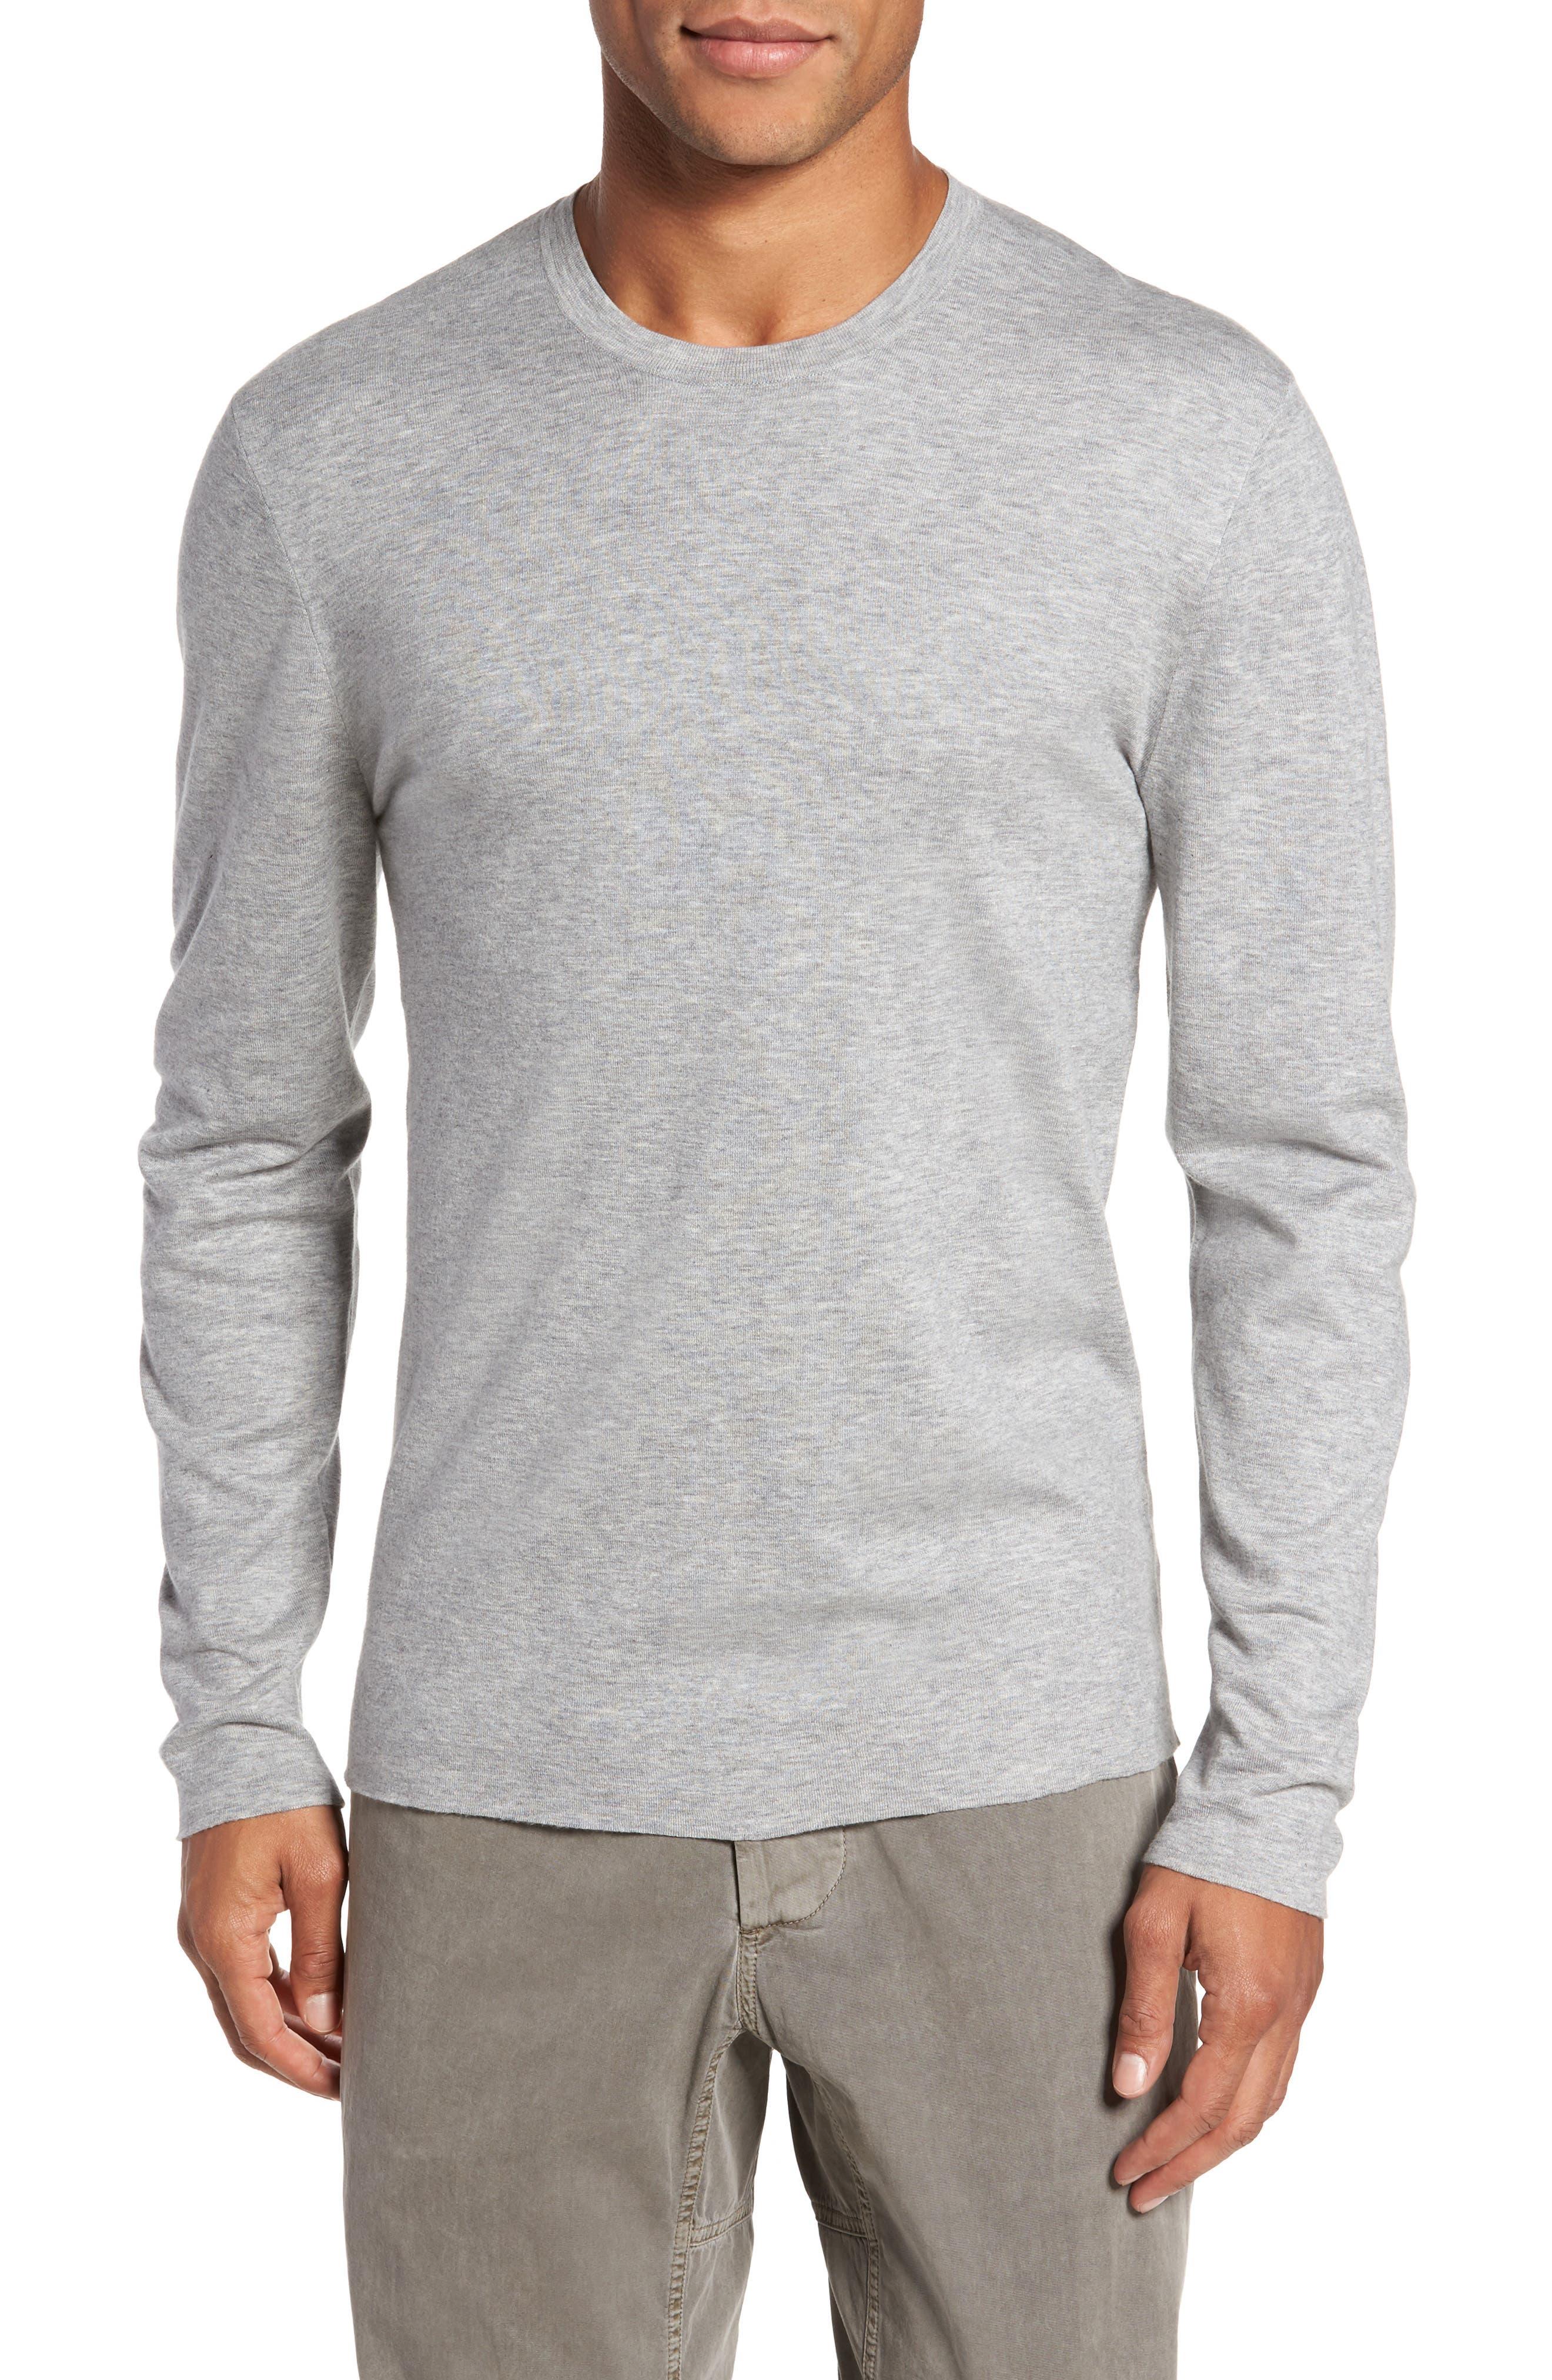 James Perse Reversible Long Sleeve T-Shirt